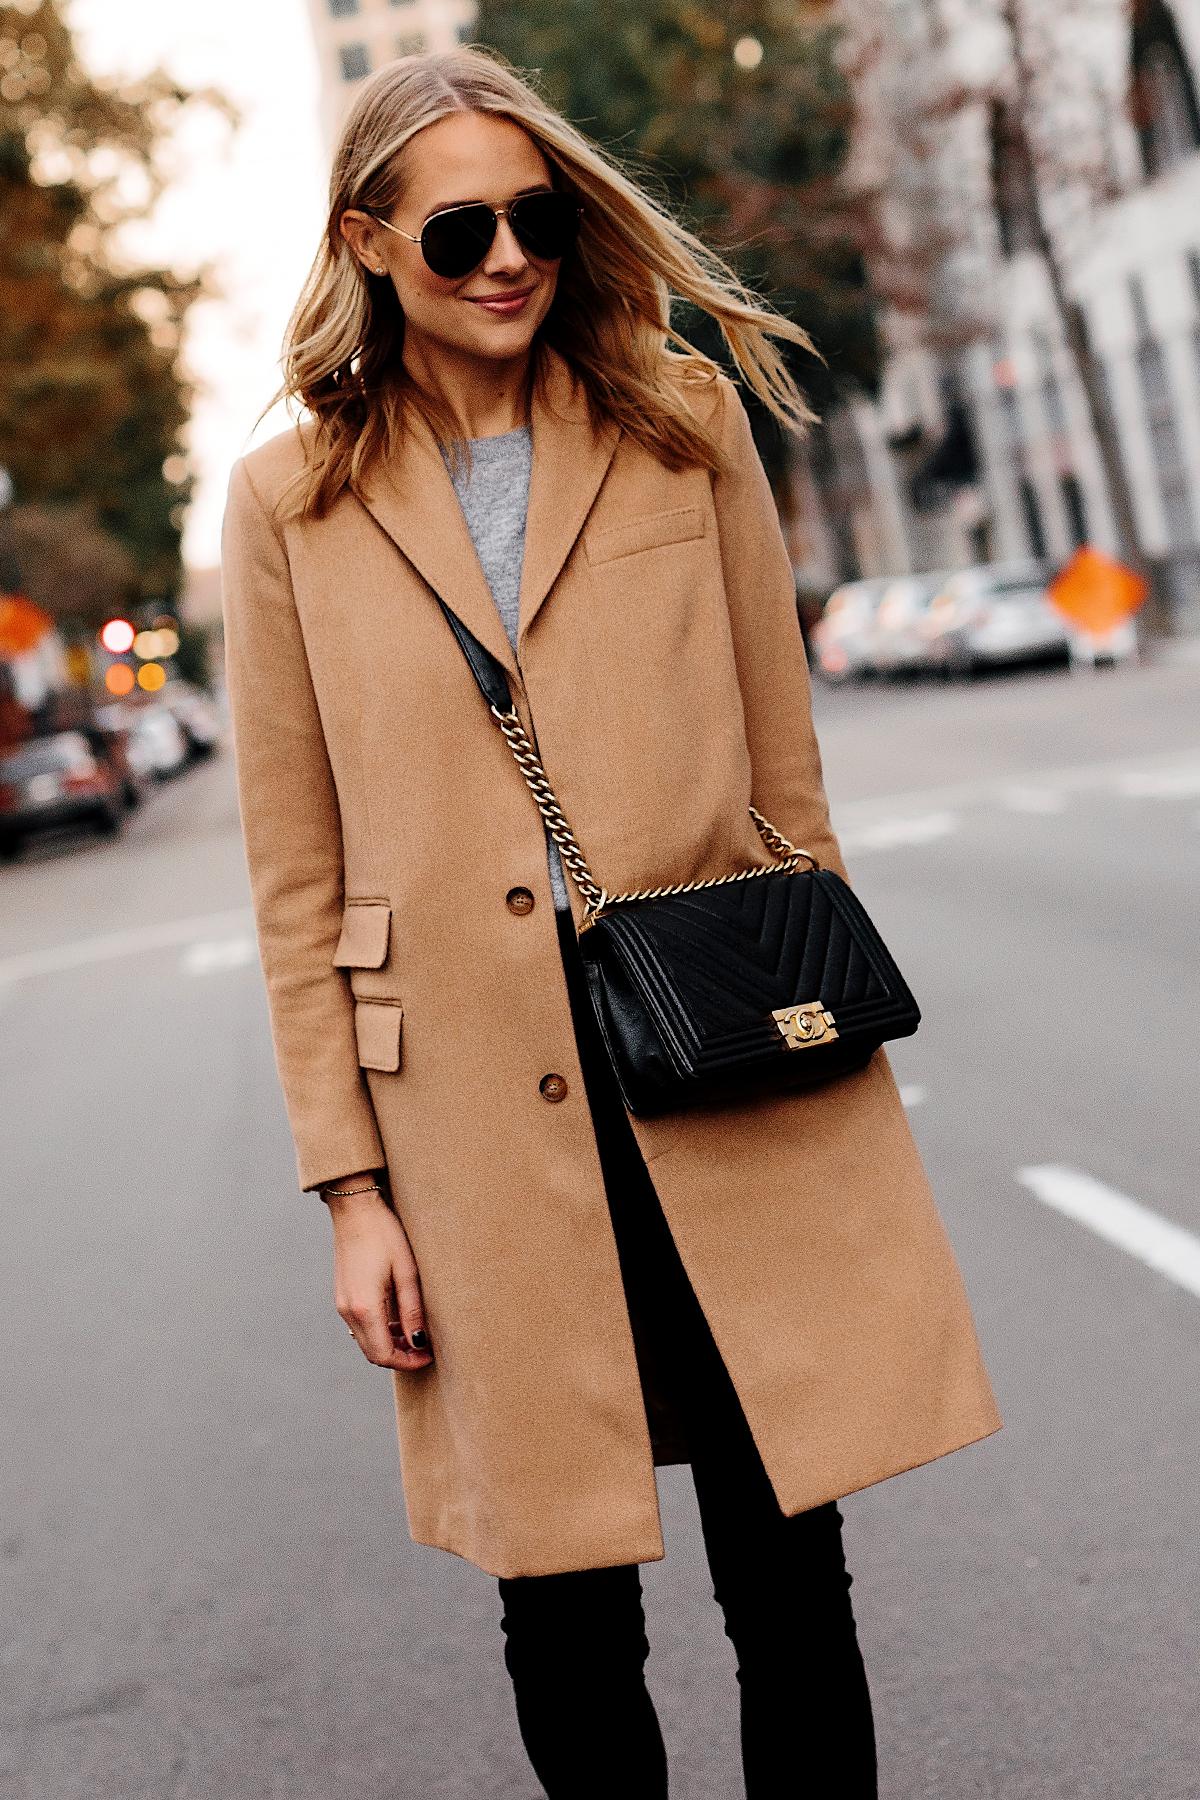 Blonde Woman Wearing Camel Coat Grey Sweater Black Skinny Jeans Outfit Chanel Black Boy Bag Fashion Jackson San Diego Fashion Blogger Street Style